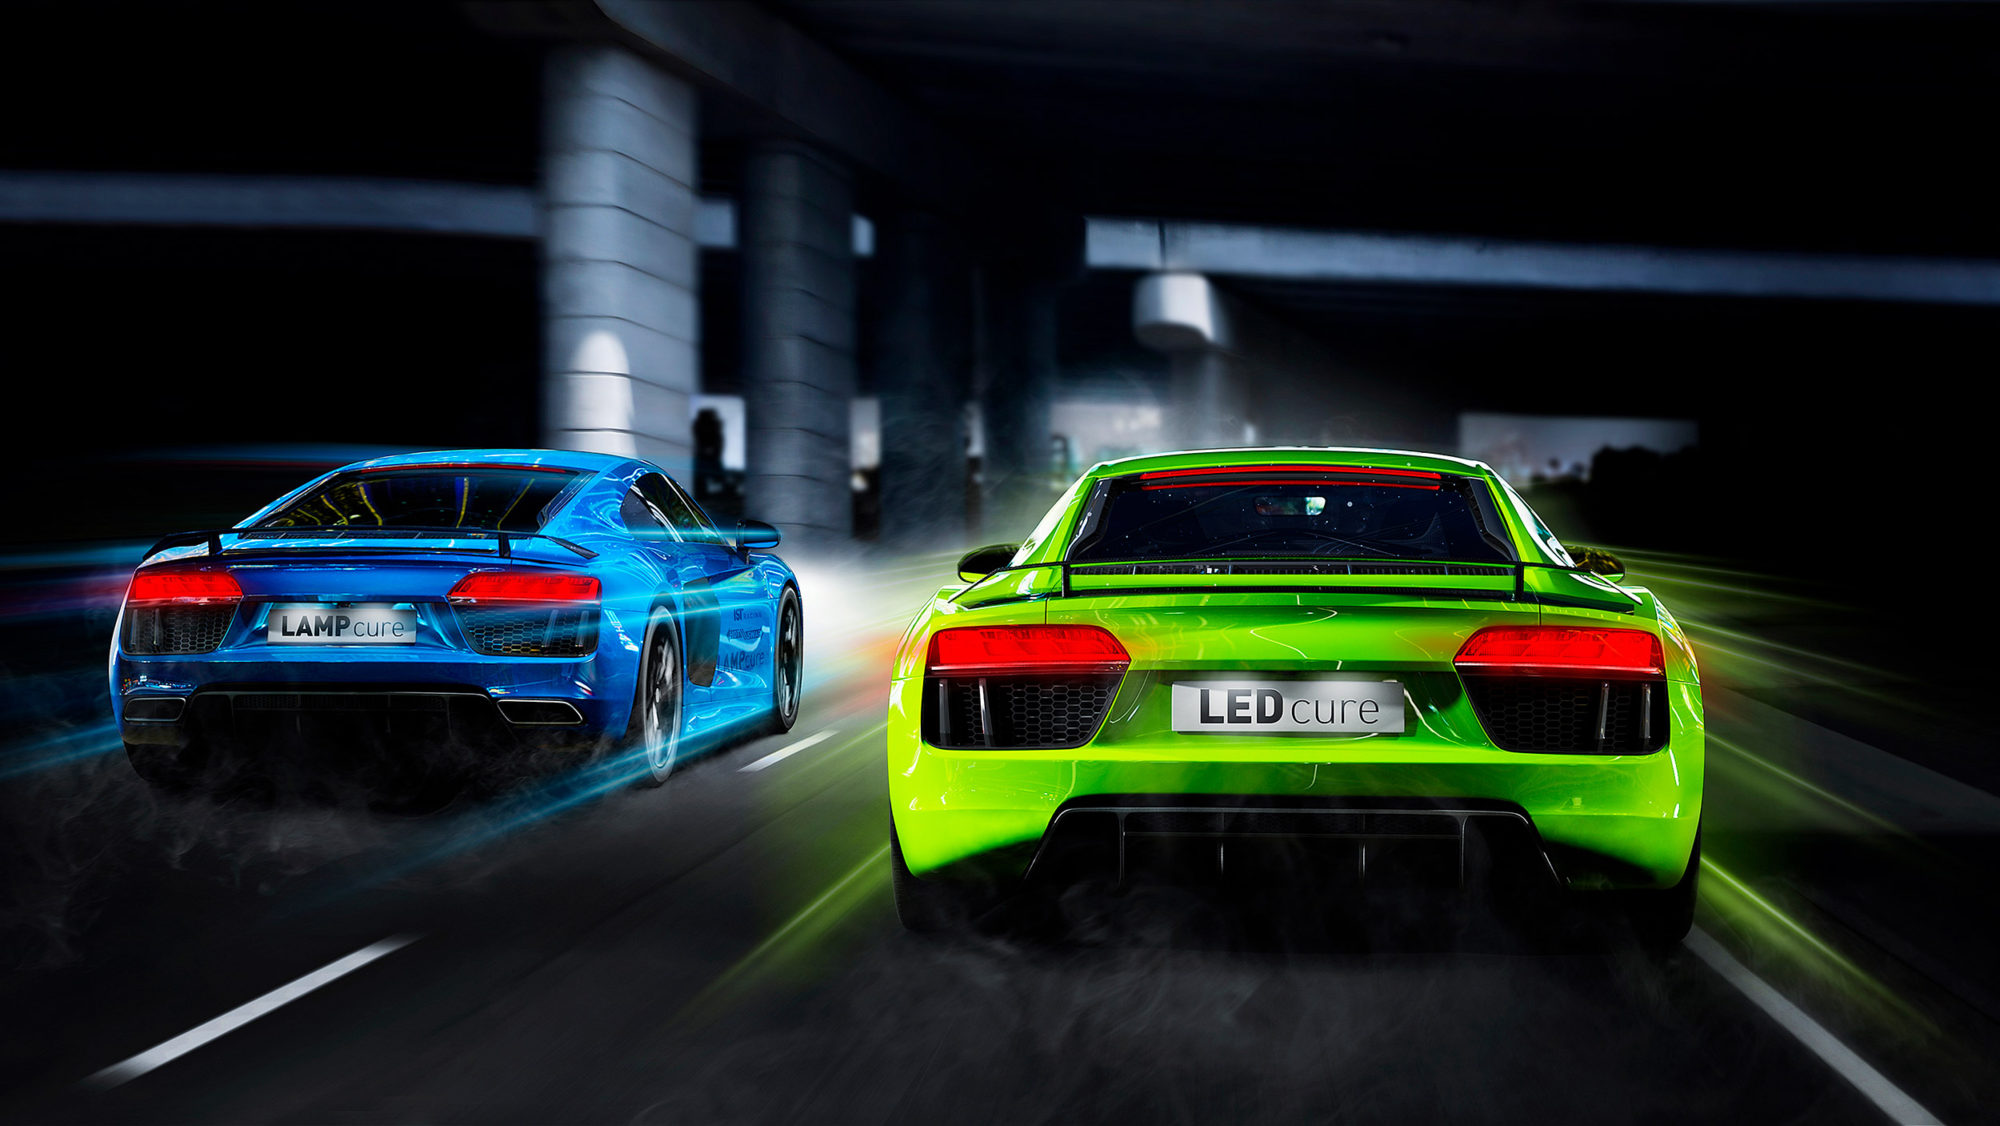 3D Rendering Automotive CGI Bildbearbeitung Fotografie Composing – Kreavis Werbeagentur